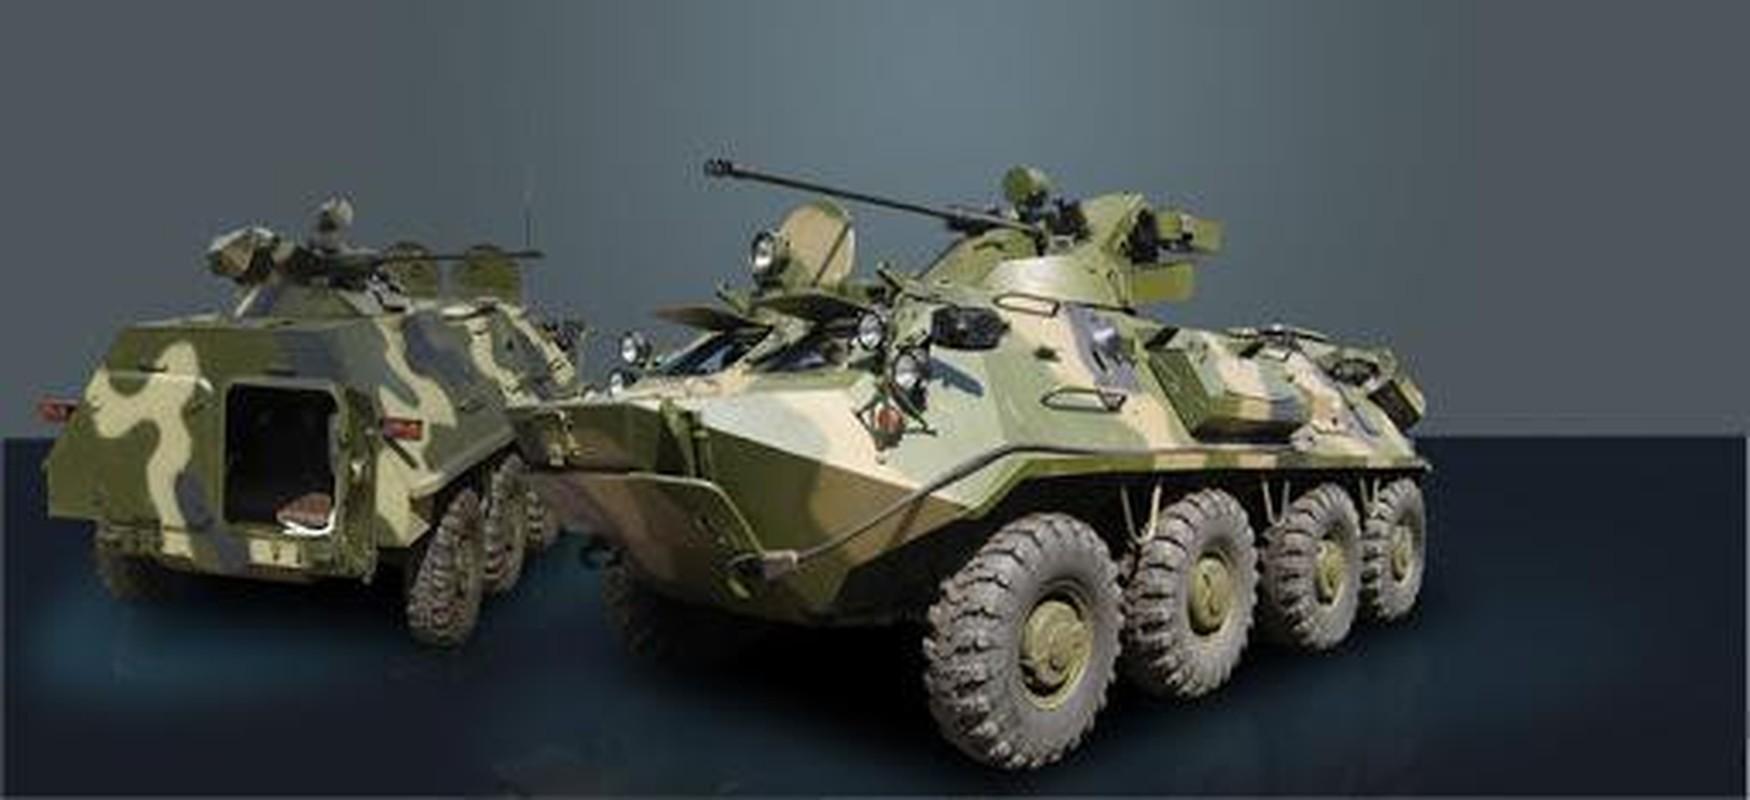 Bao Nga goi y cau hinh vu khi cua thiet giap BTR-60 cua Viet Nam-Hinh-6